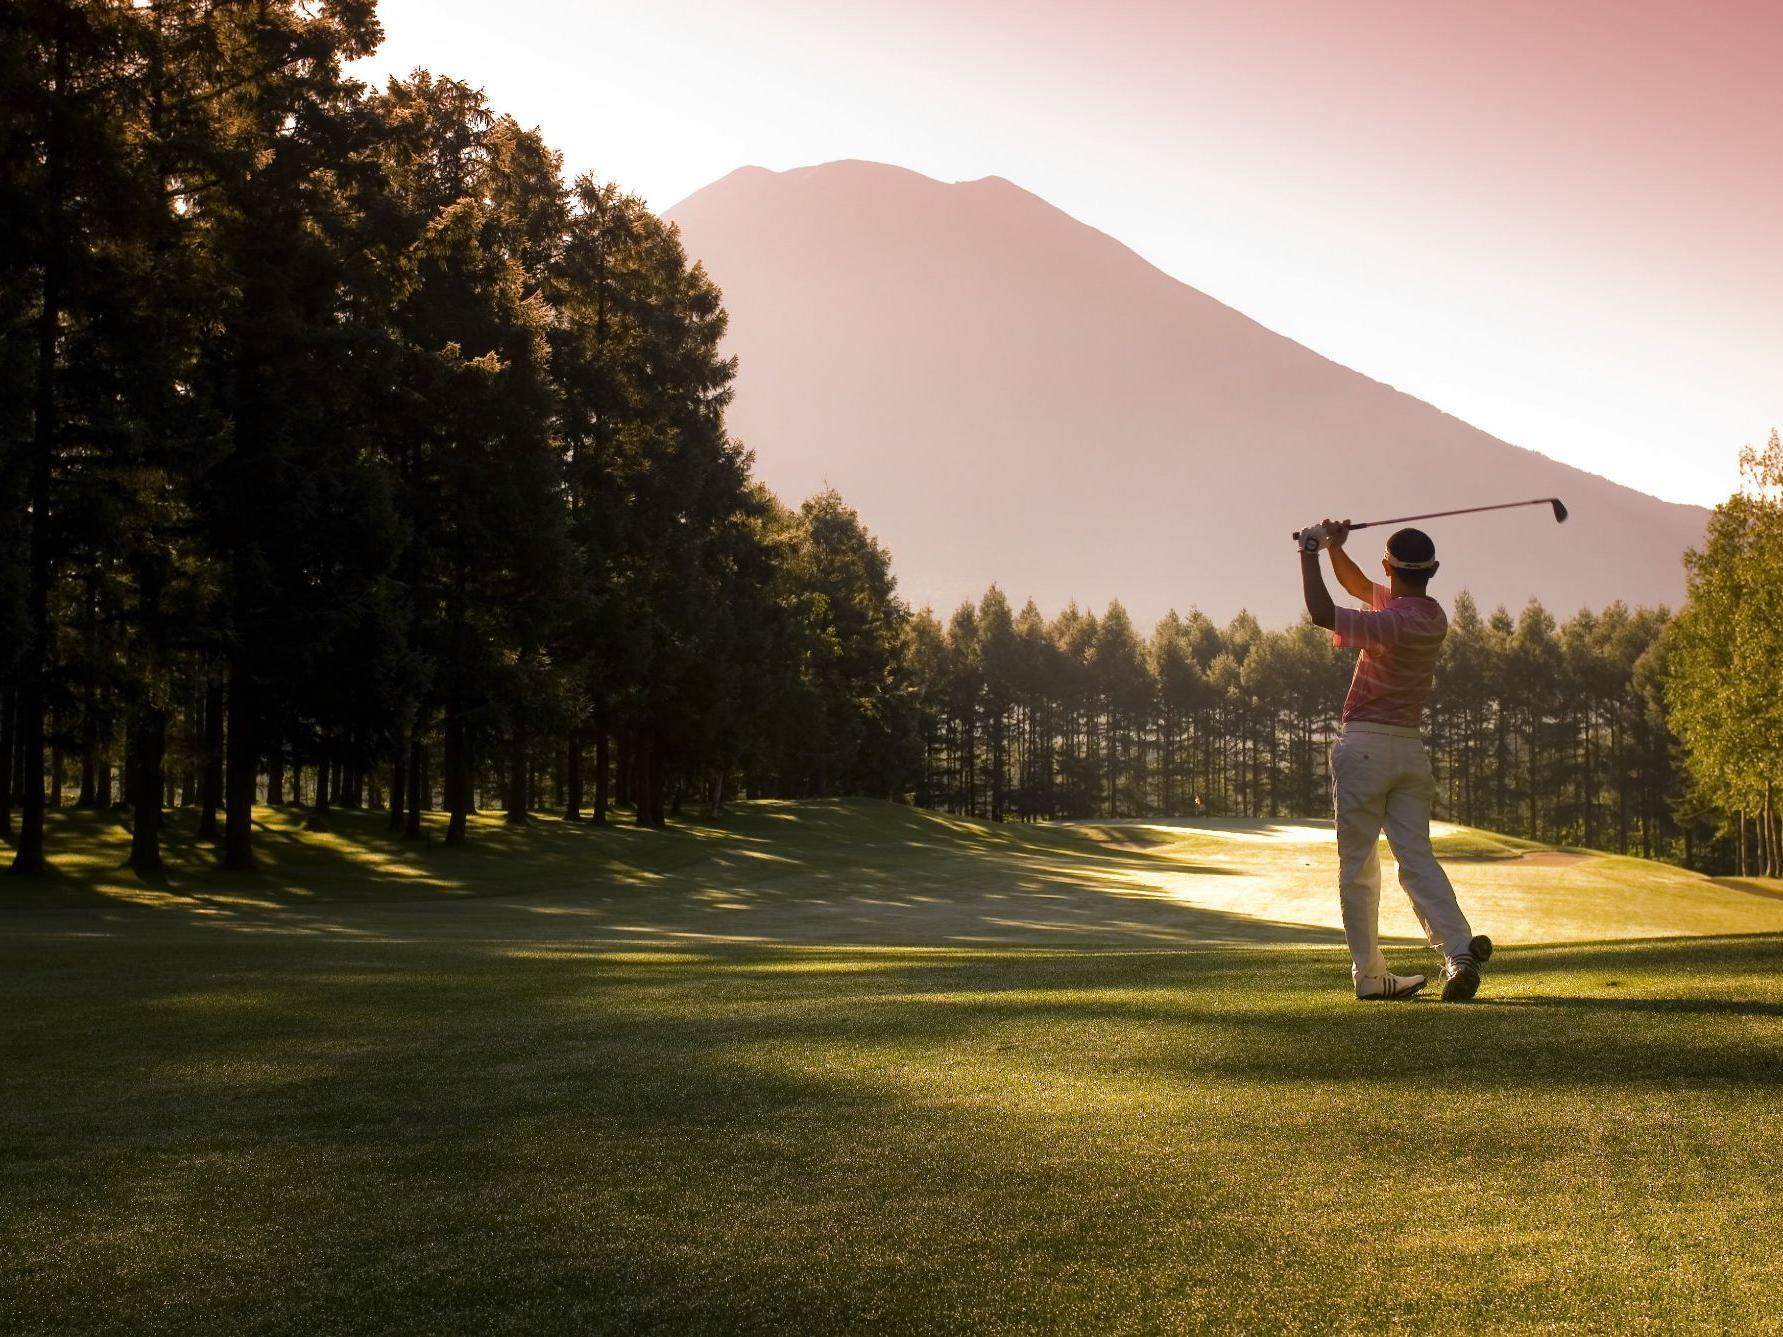 A man playing golf in Hanazono golf course near Chatrium Niseko Japan